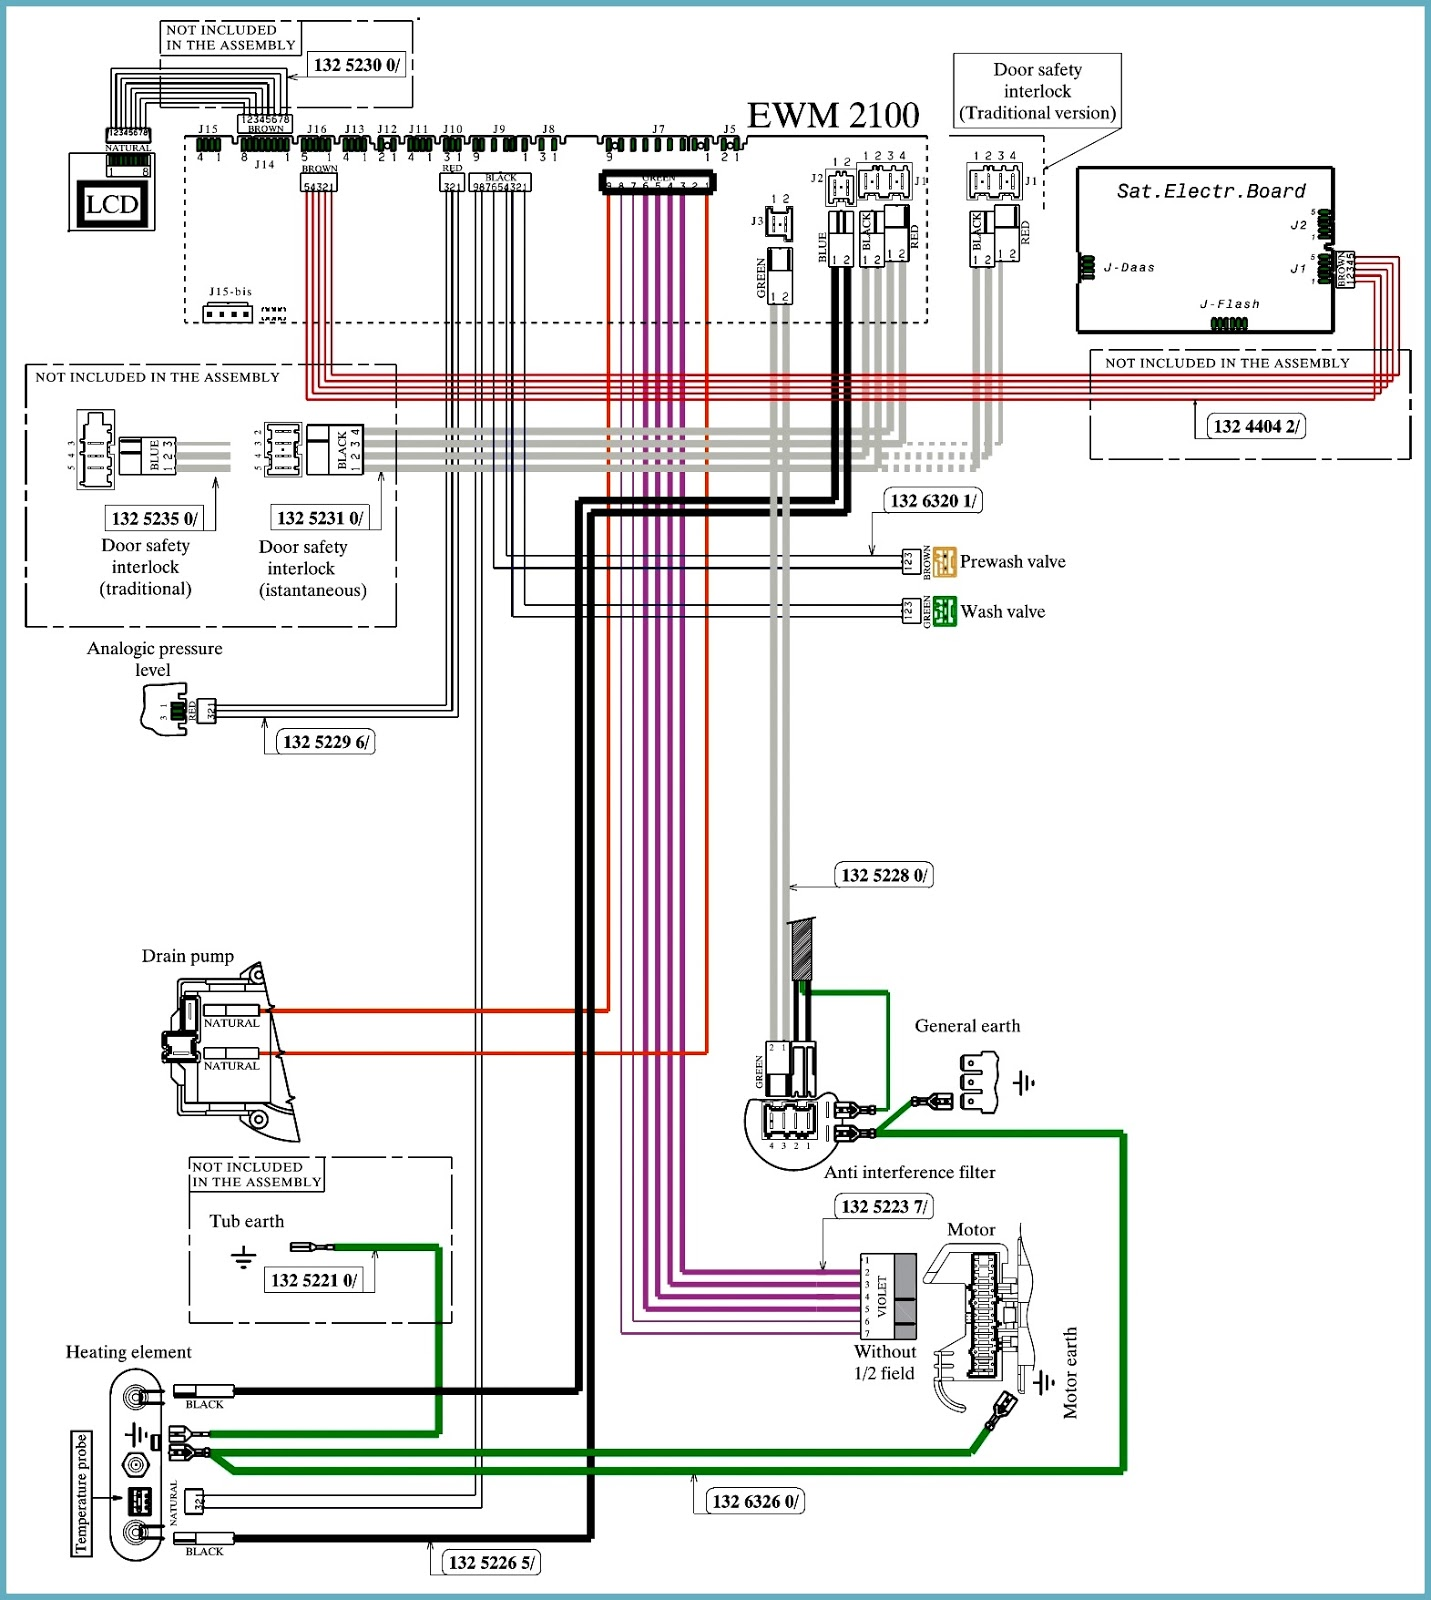 mod wiring electrolux diagram frc05lsdwo wiring diagram mod wiring electrolux diagram frc05lsdwo [ 1431 x 1600 Pixel ]